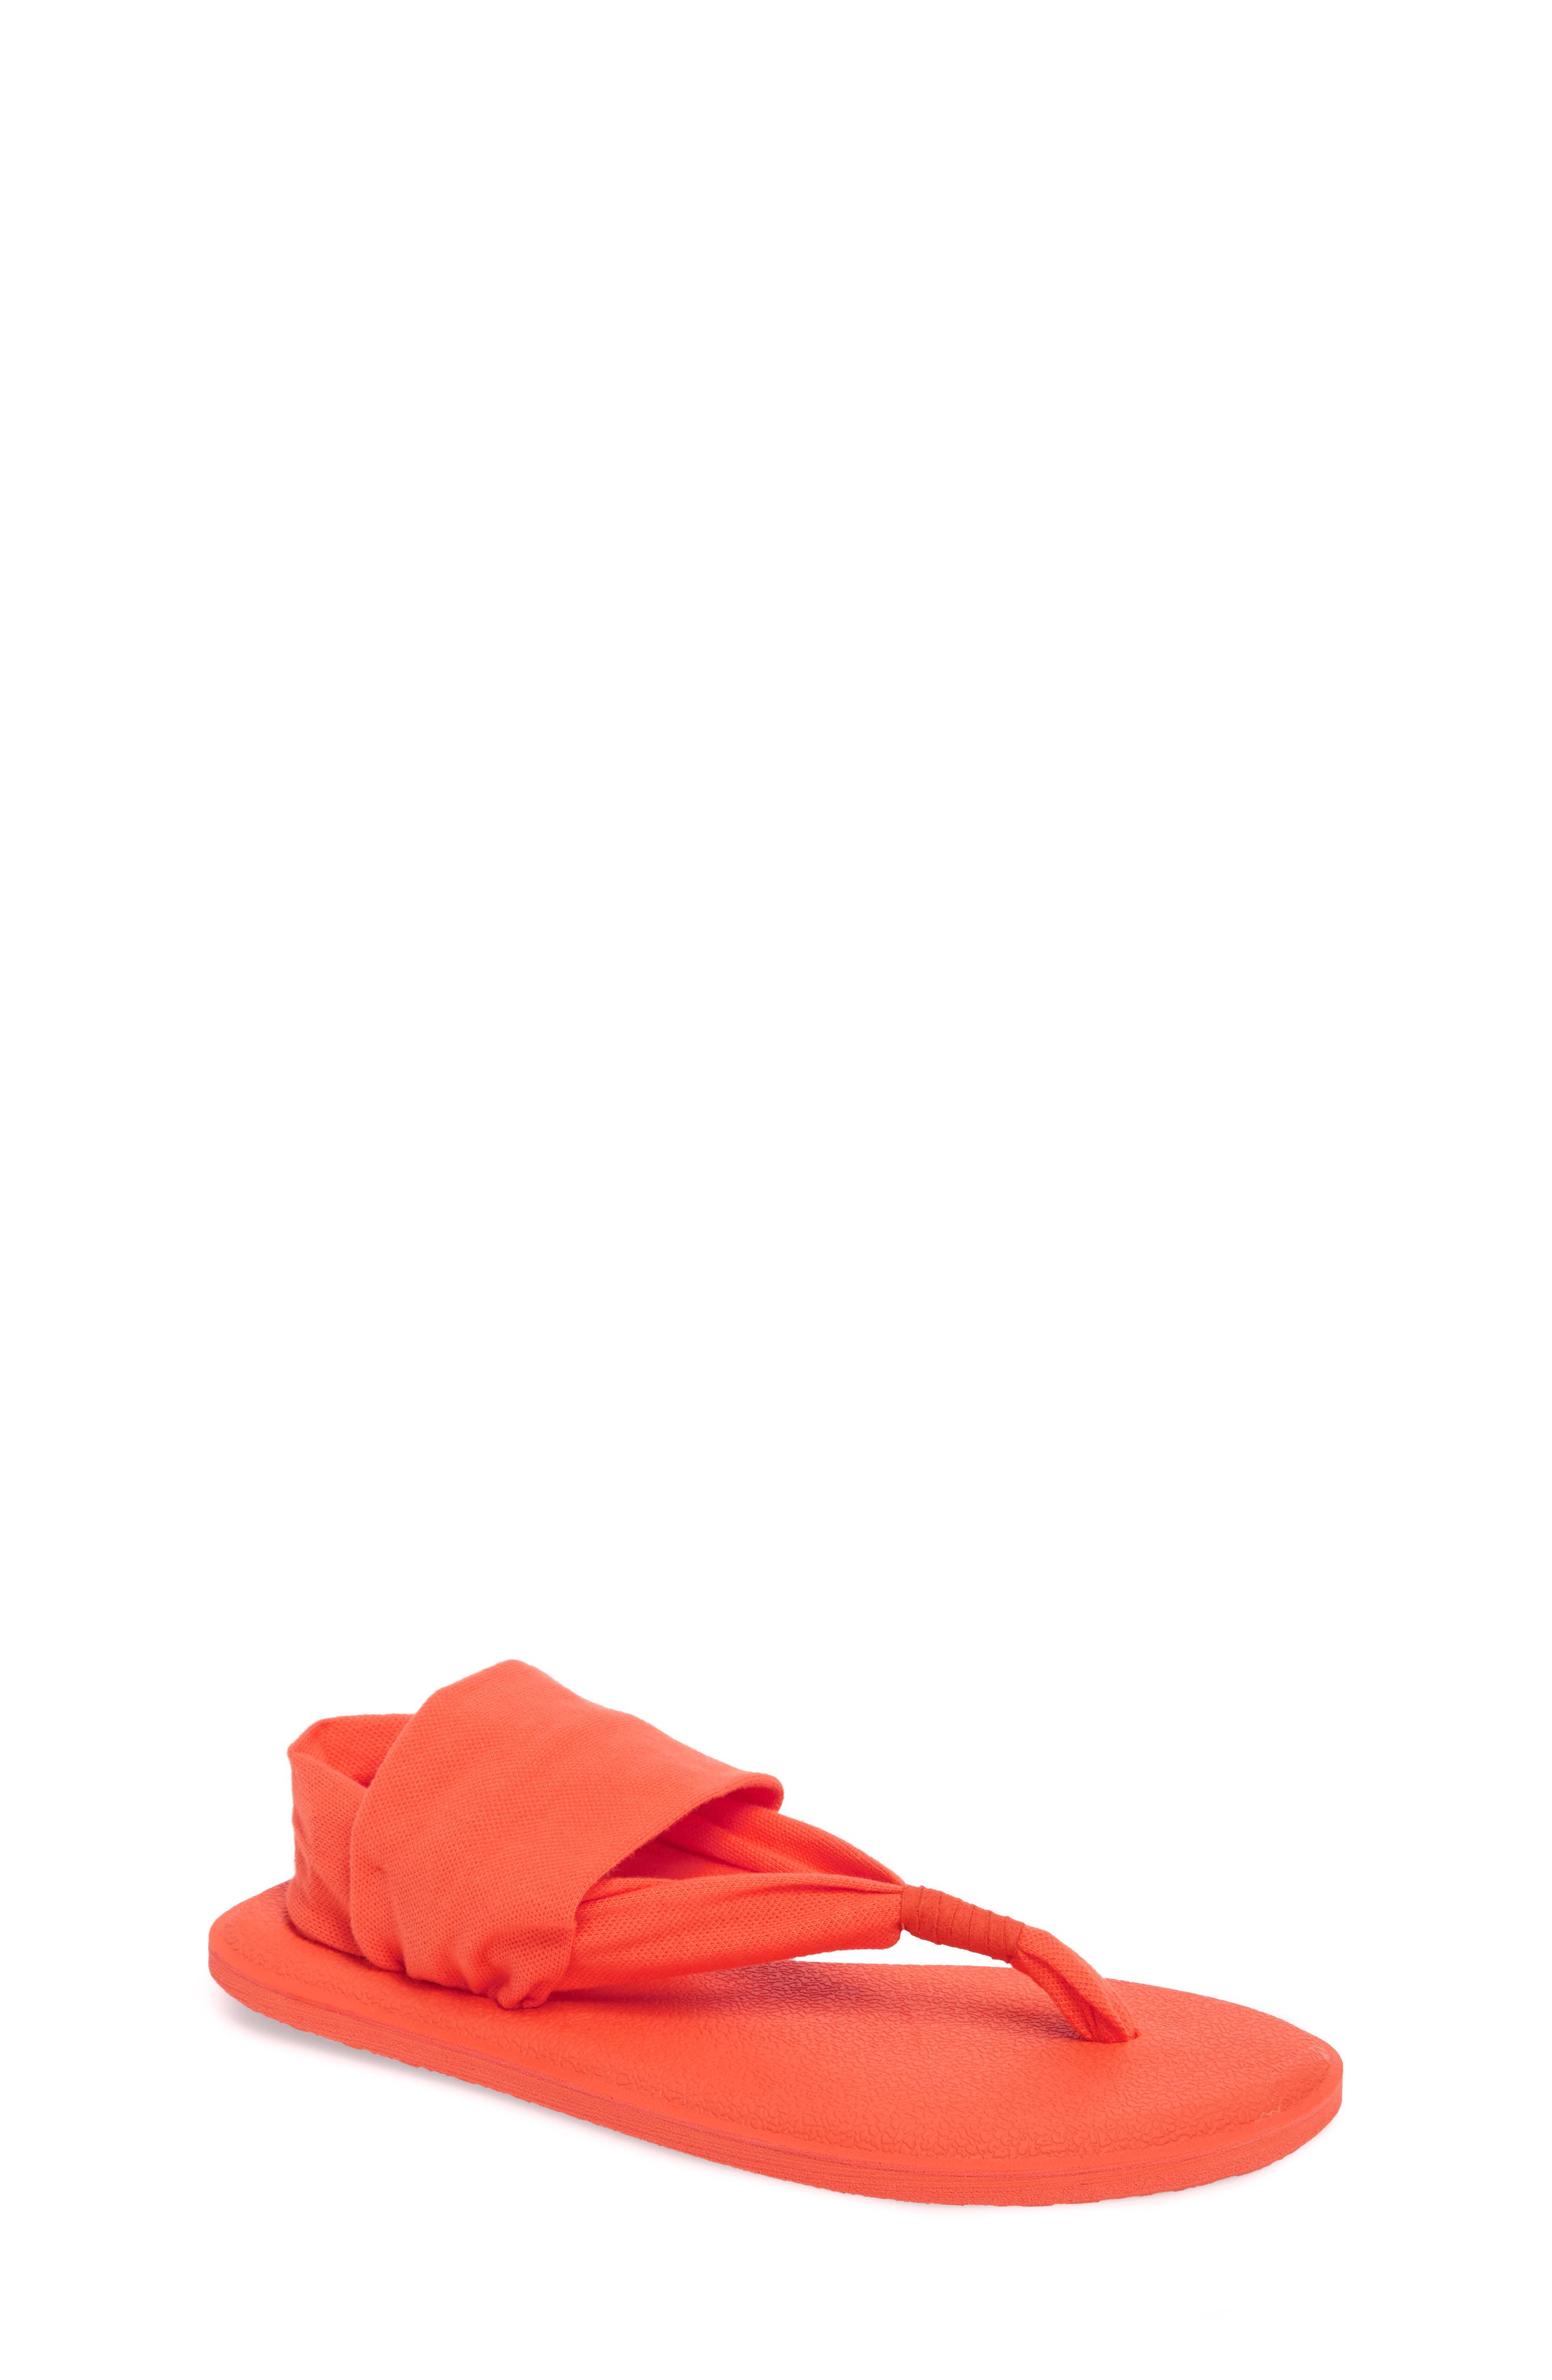 'Yoga Sling Burst' Sandal,                             Main thumbnail 1, color,                             Nasturium